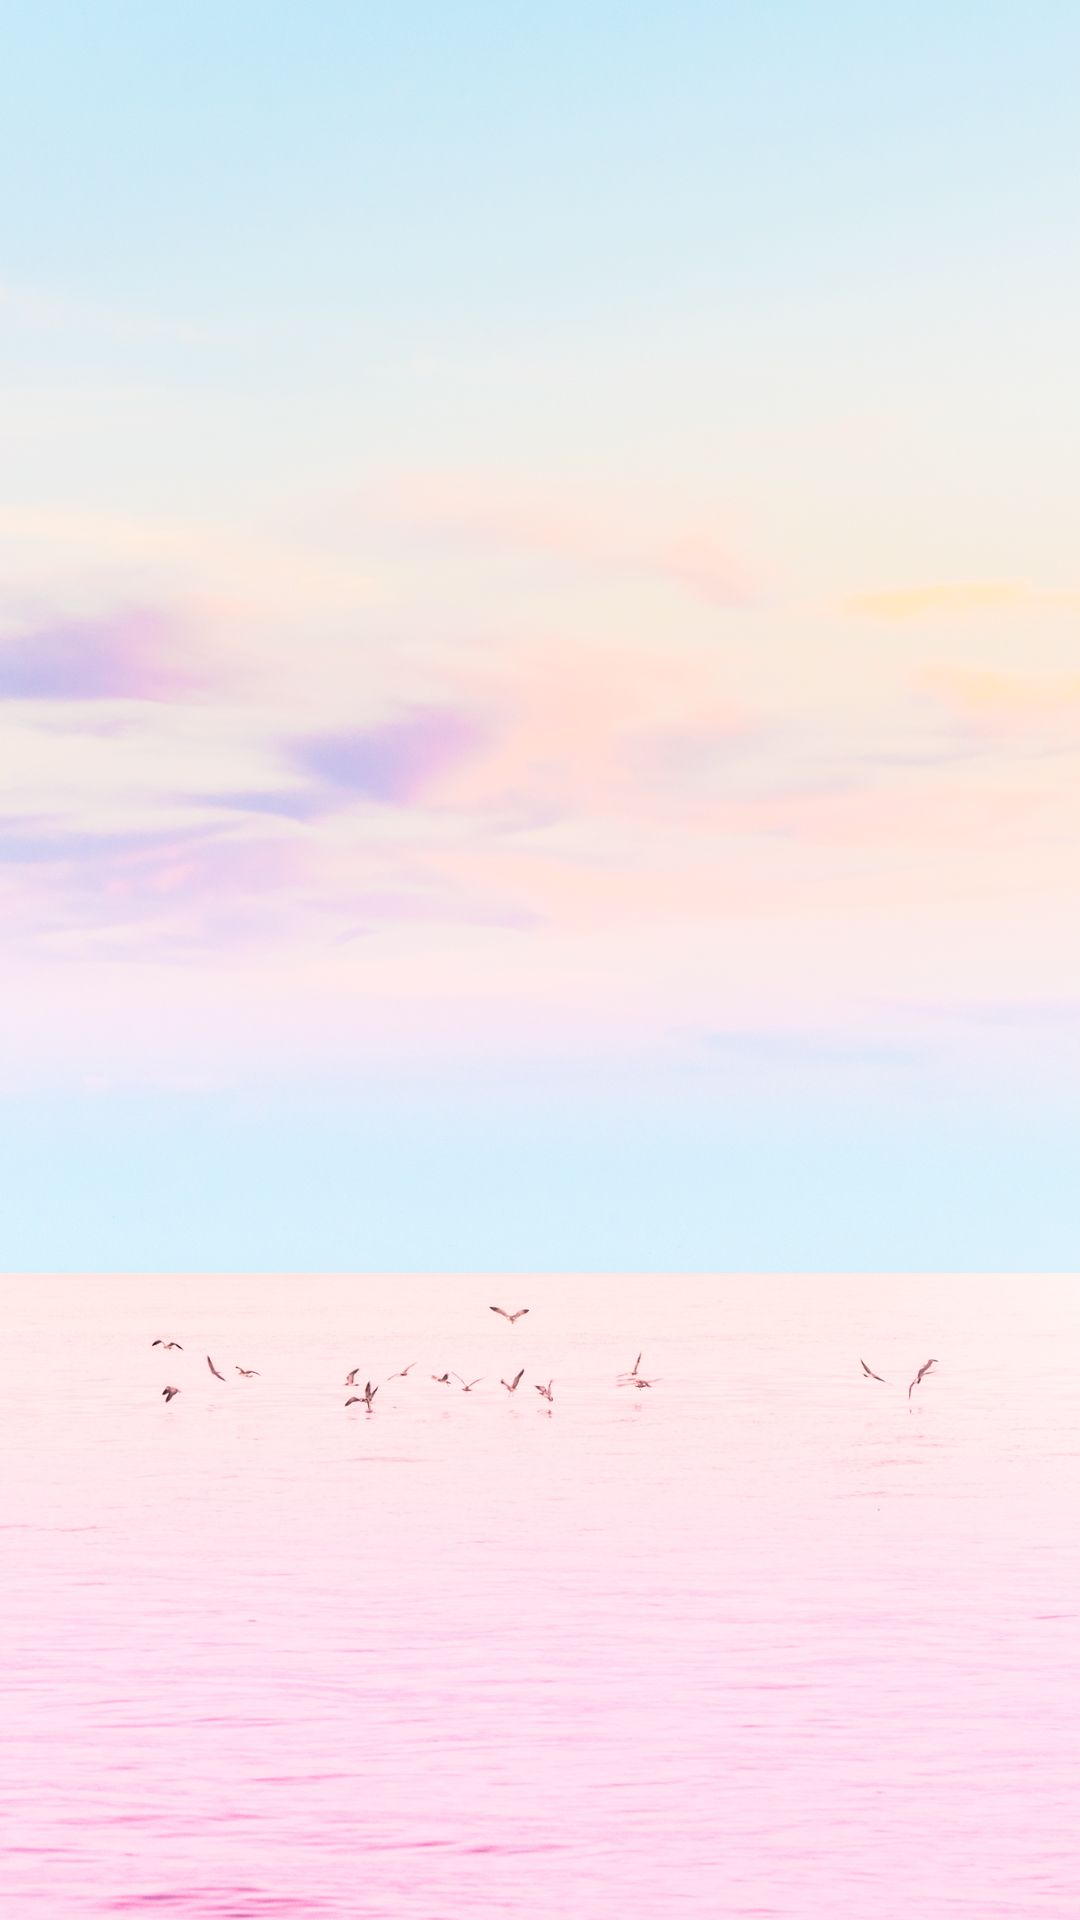 Birds At Sea Pastel Pink Iphone 6 Plus Hd Wallpaper Cuteiphonewallpaperstumblr Iphonewallp Iphone Wallpaper Sky Unique Iphone Wallpaper Minimalist Wallpaper